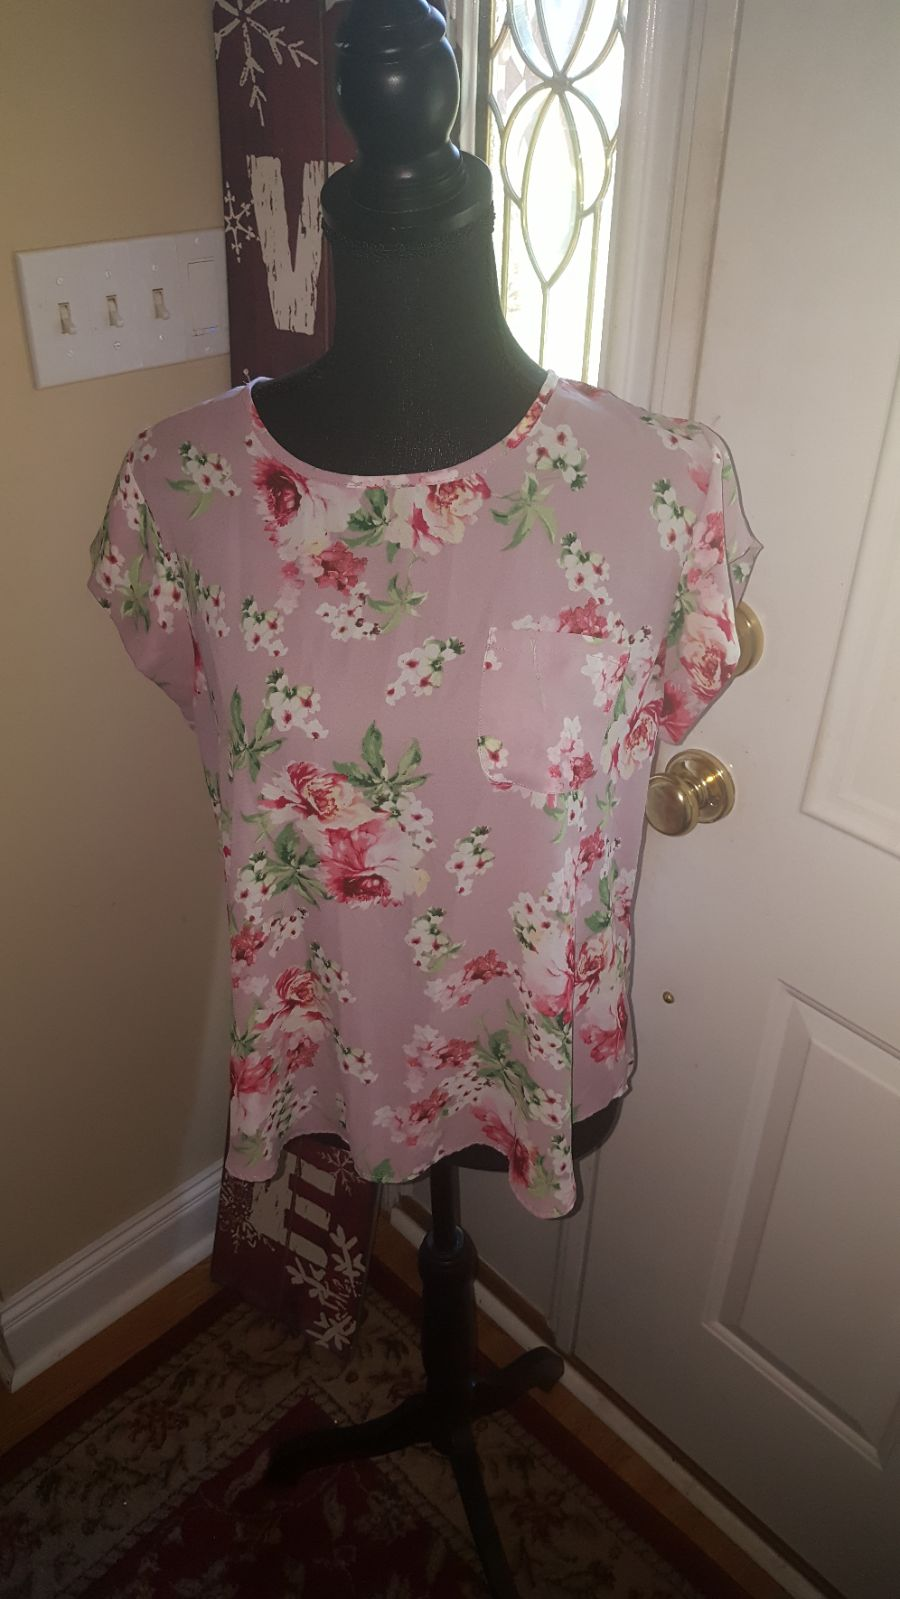 Lily White Blouse Shirt